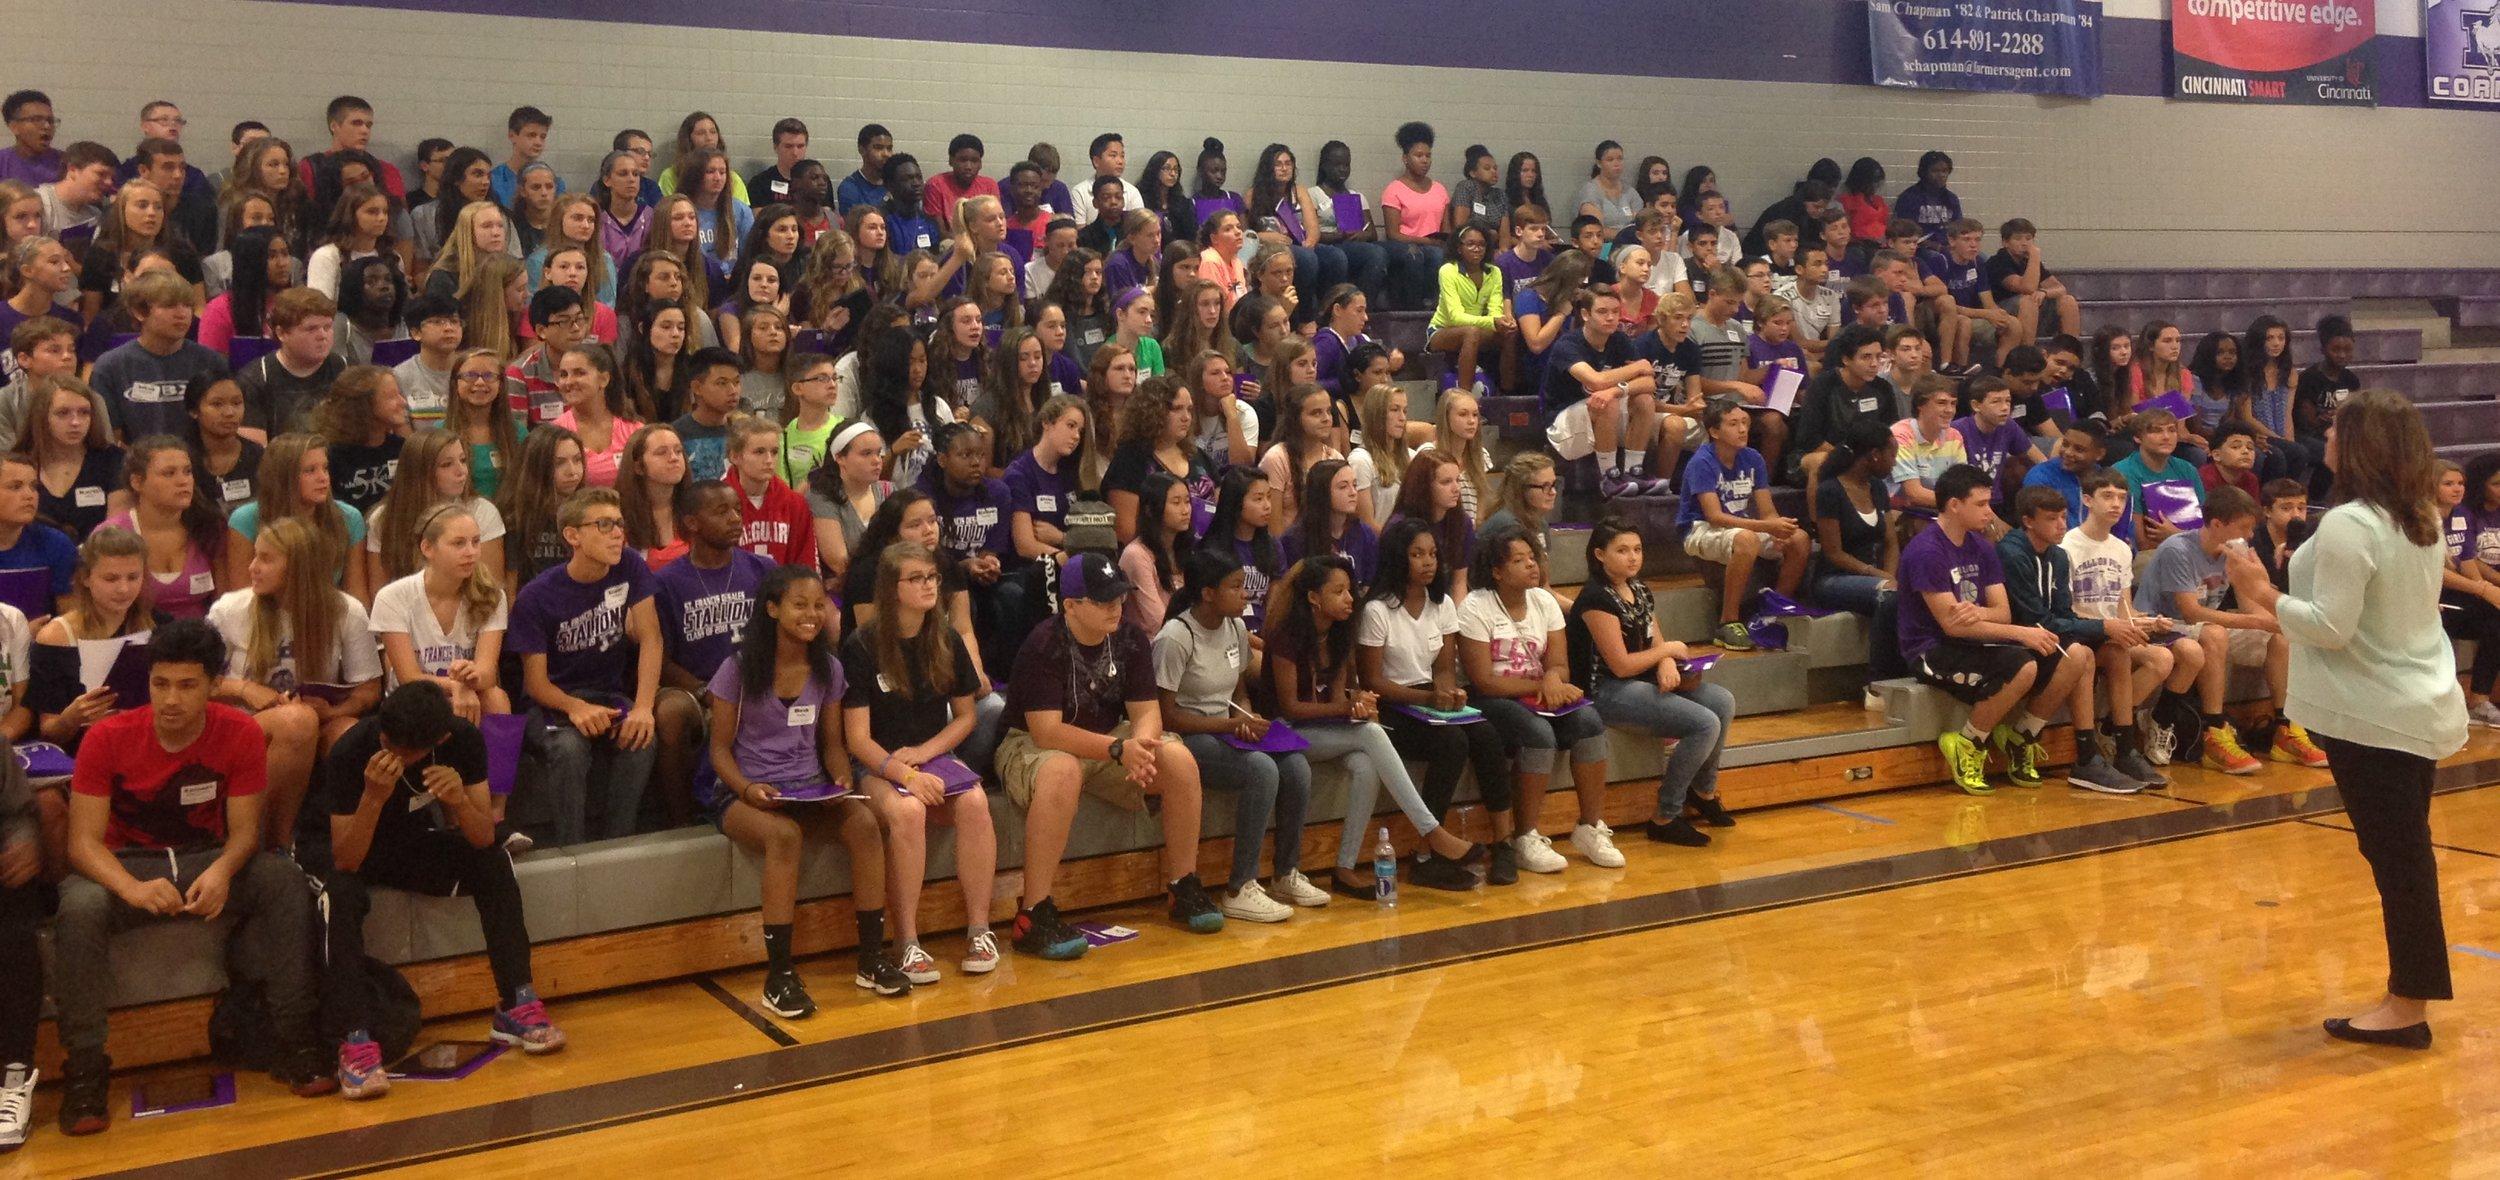 The Class of 2019 Freshmen Orientation - August, 2015